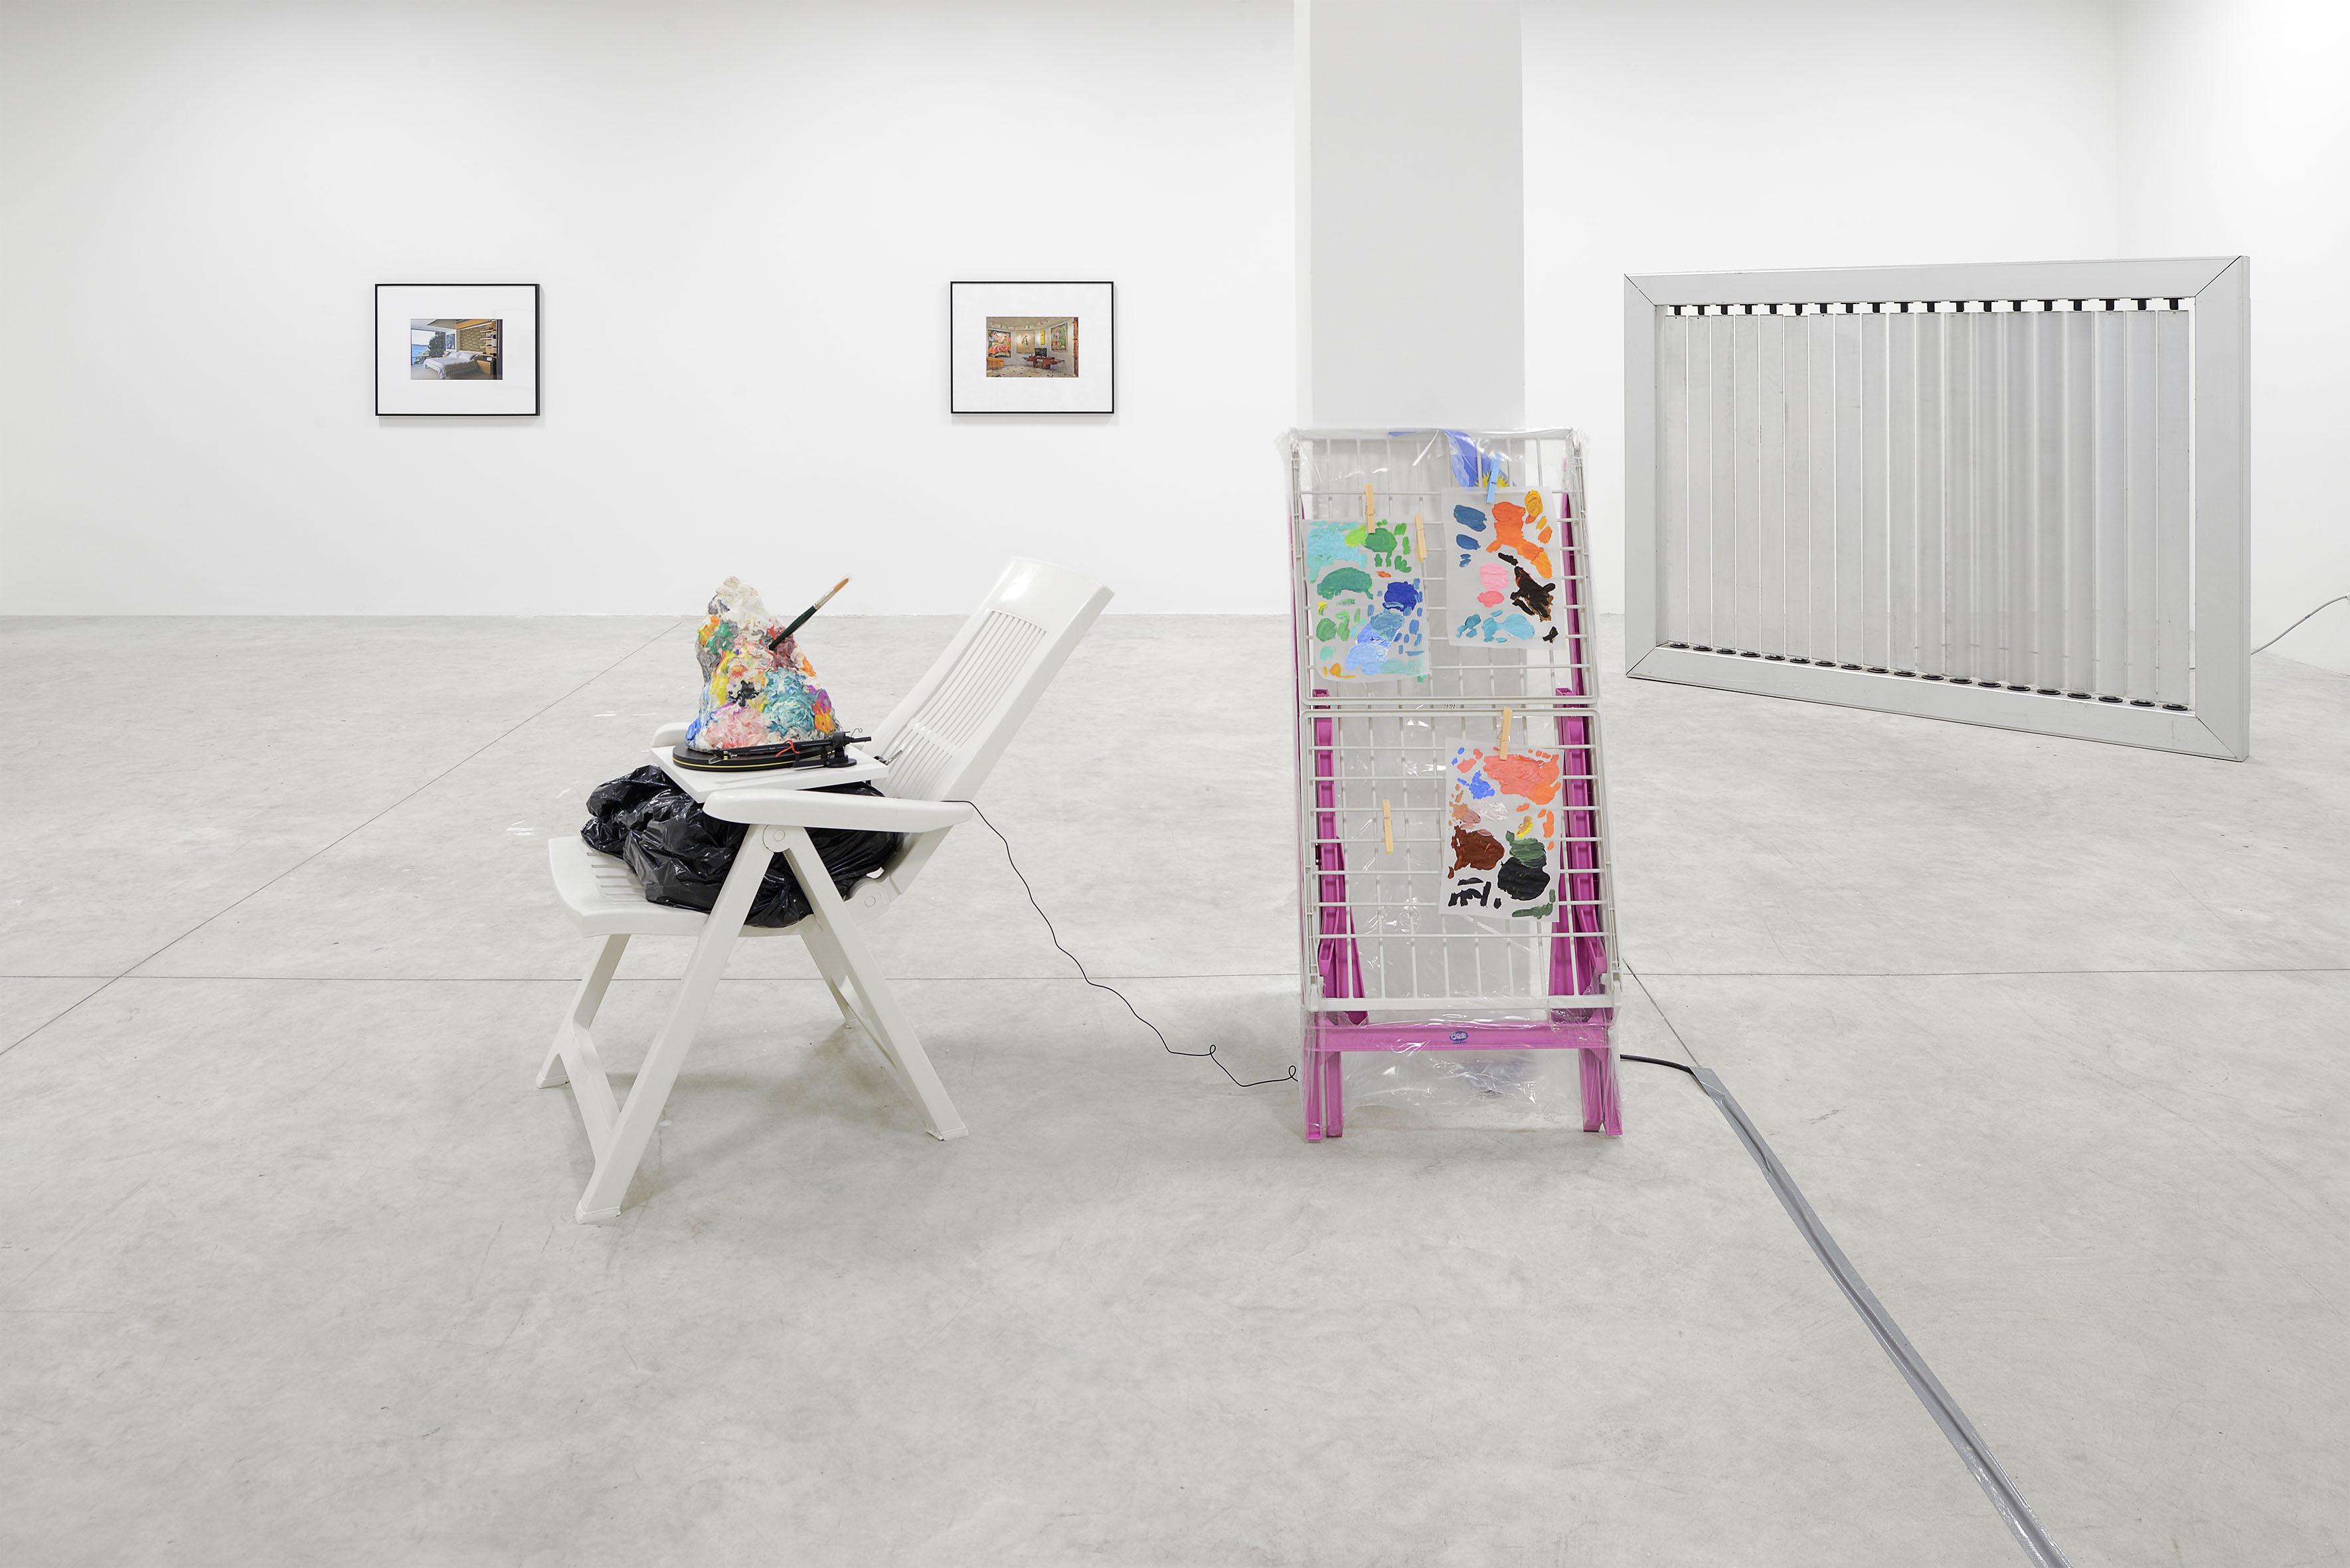 Dan Rees – Road Back To Relevance – installation view at Nomas Foundation, Roma 2016 – photo Roberto Apa